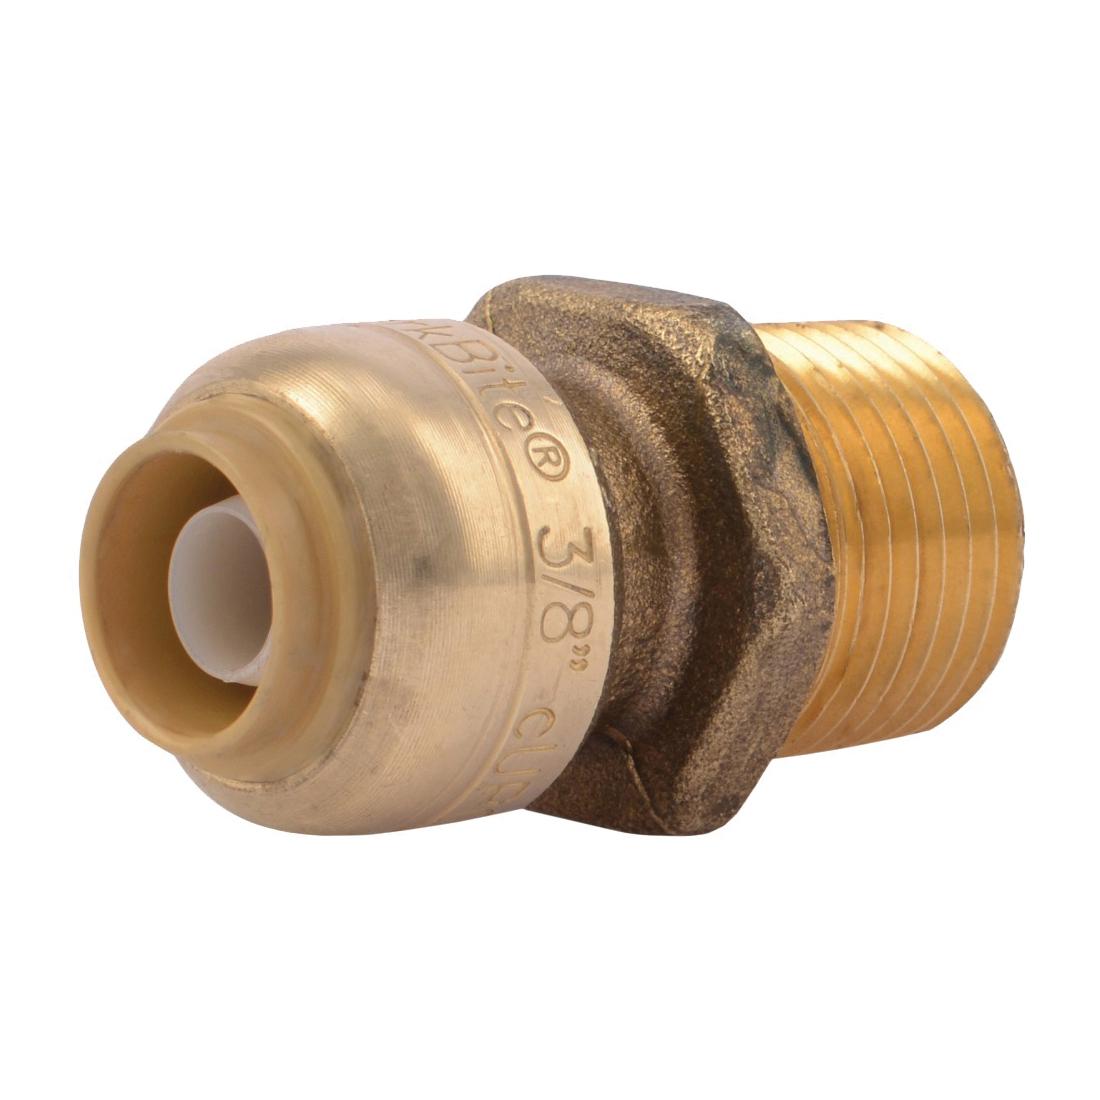 Picture of SharkBite U118LFA Pipe Connector, 3/8 x 1/2 in, MNPT x MNPT, Brass, 200 psi Pressure